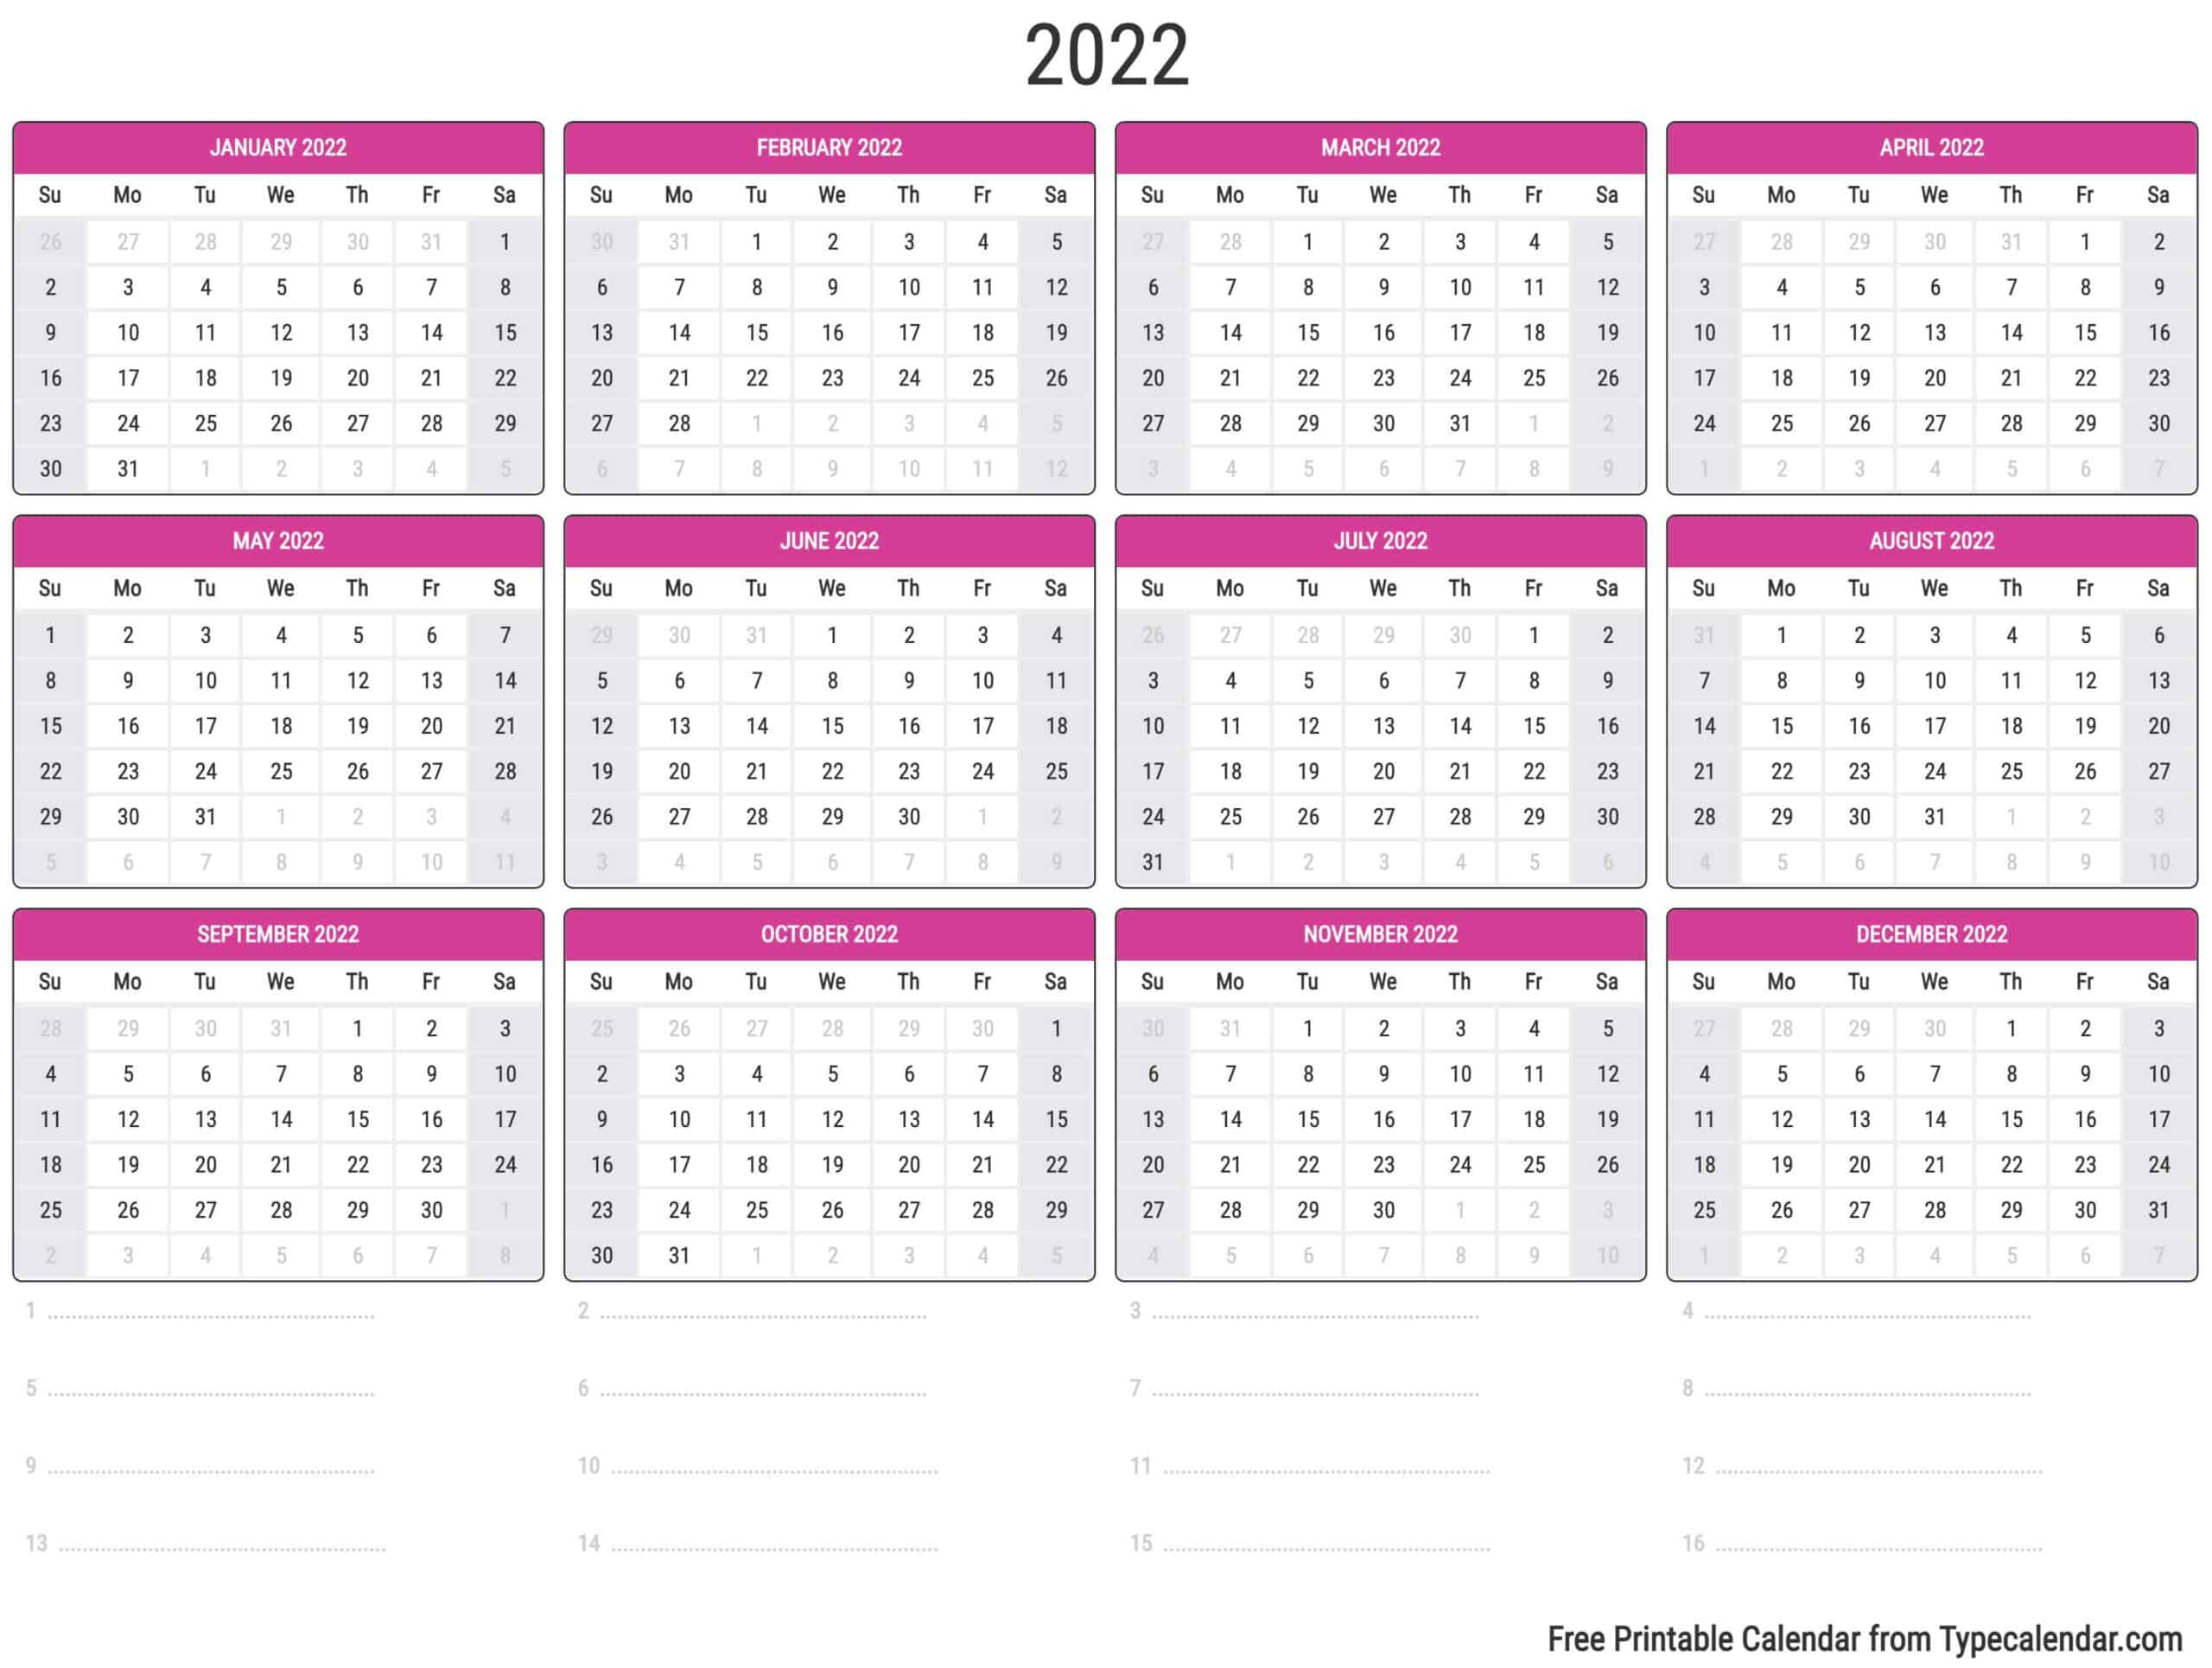 2022 2023 Calendar.Free Printable Year 2022 Calendar Type Calendar